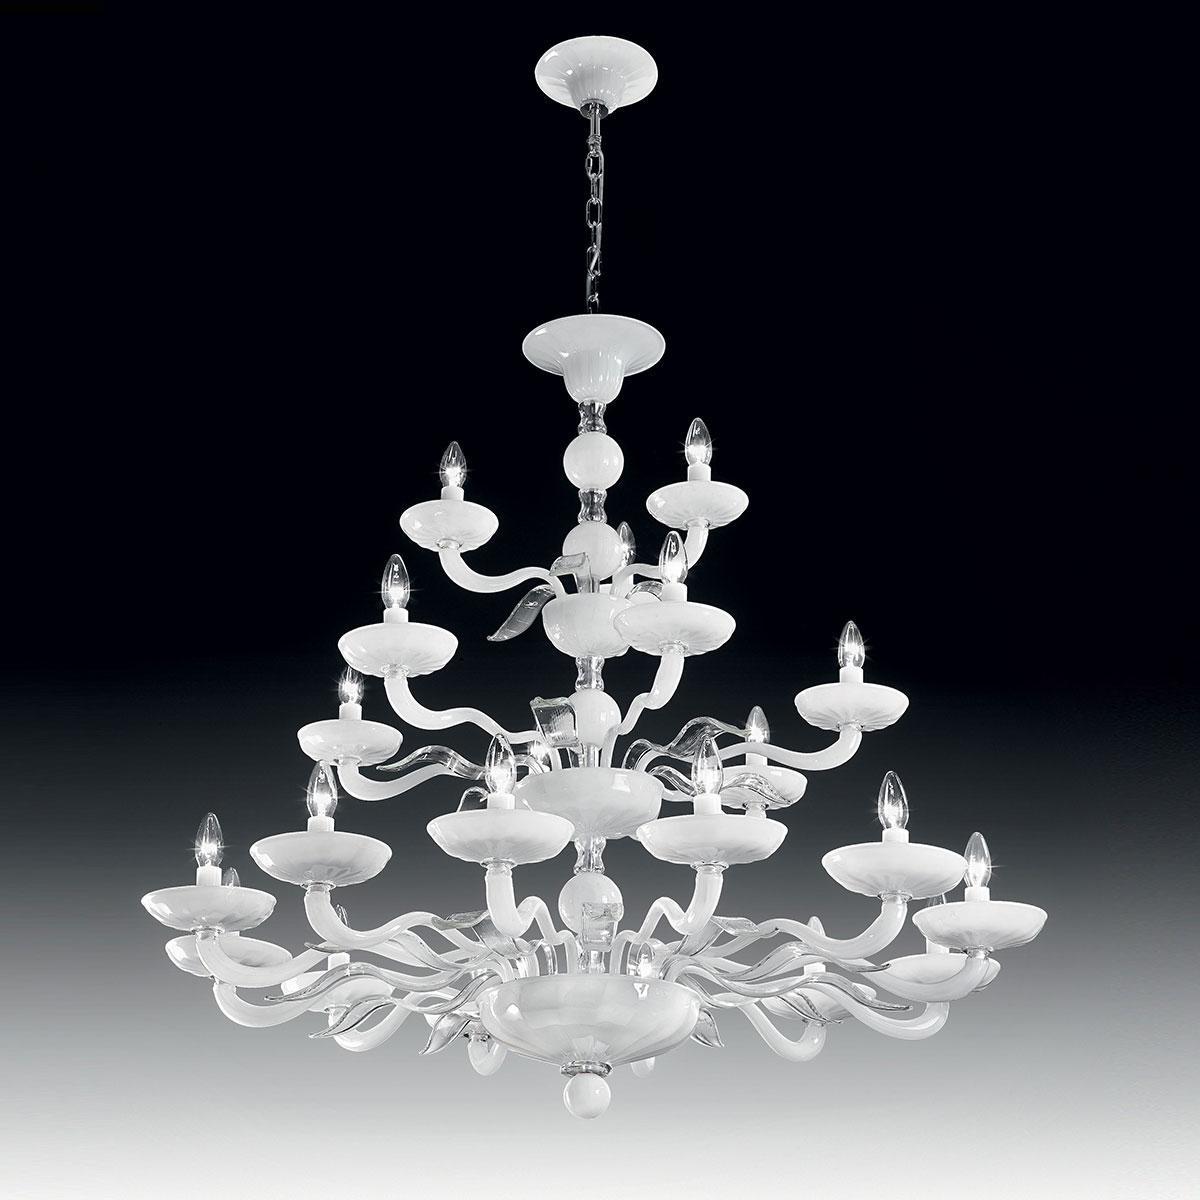 """Hypnos"" lampara de araña de Murano dos niveles - 12+6+3 luces - blanco y transparent"